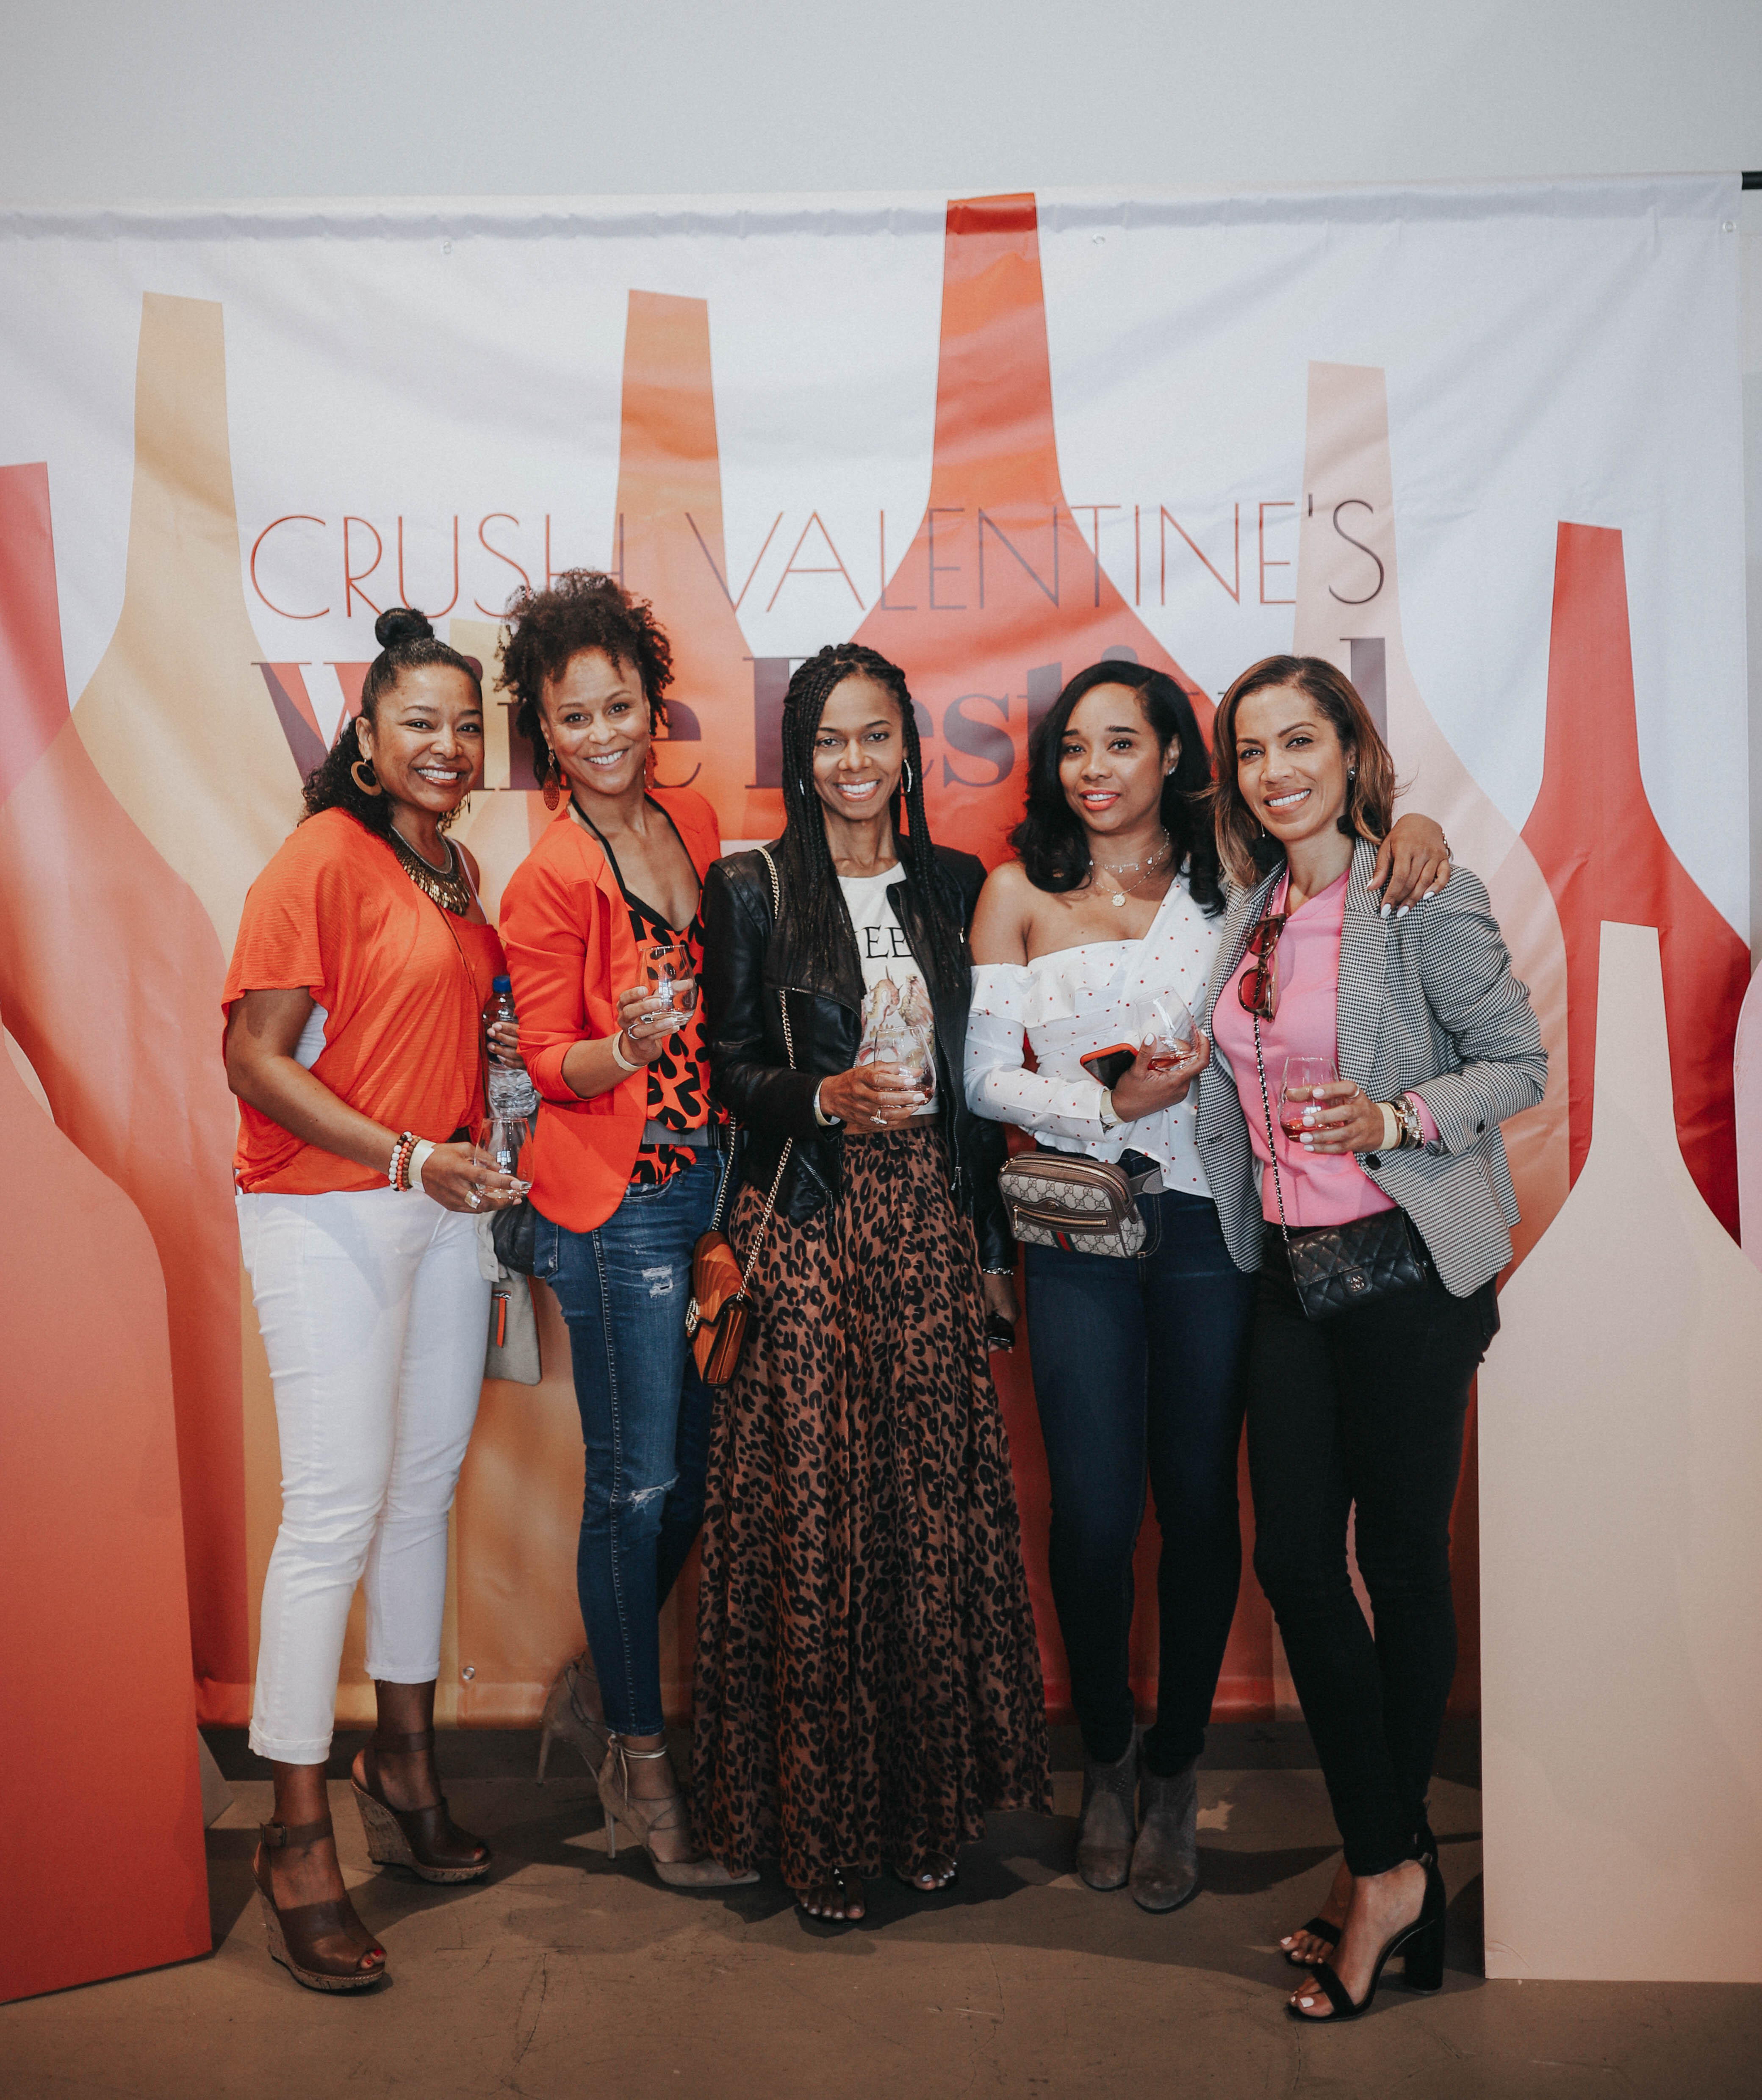 Crush Valentine's Wine Fest